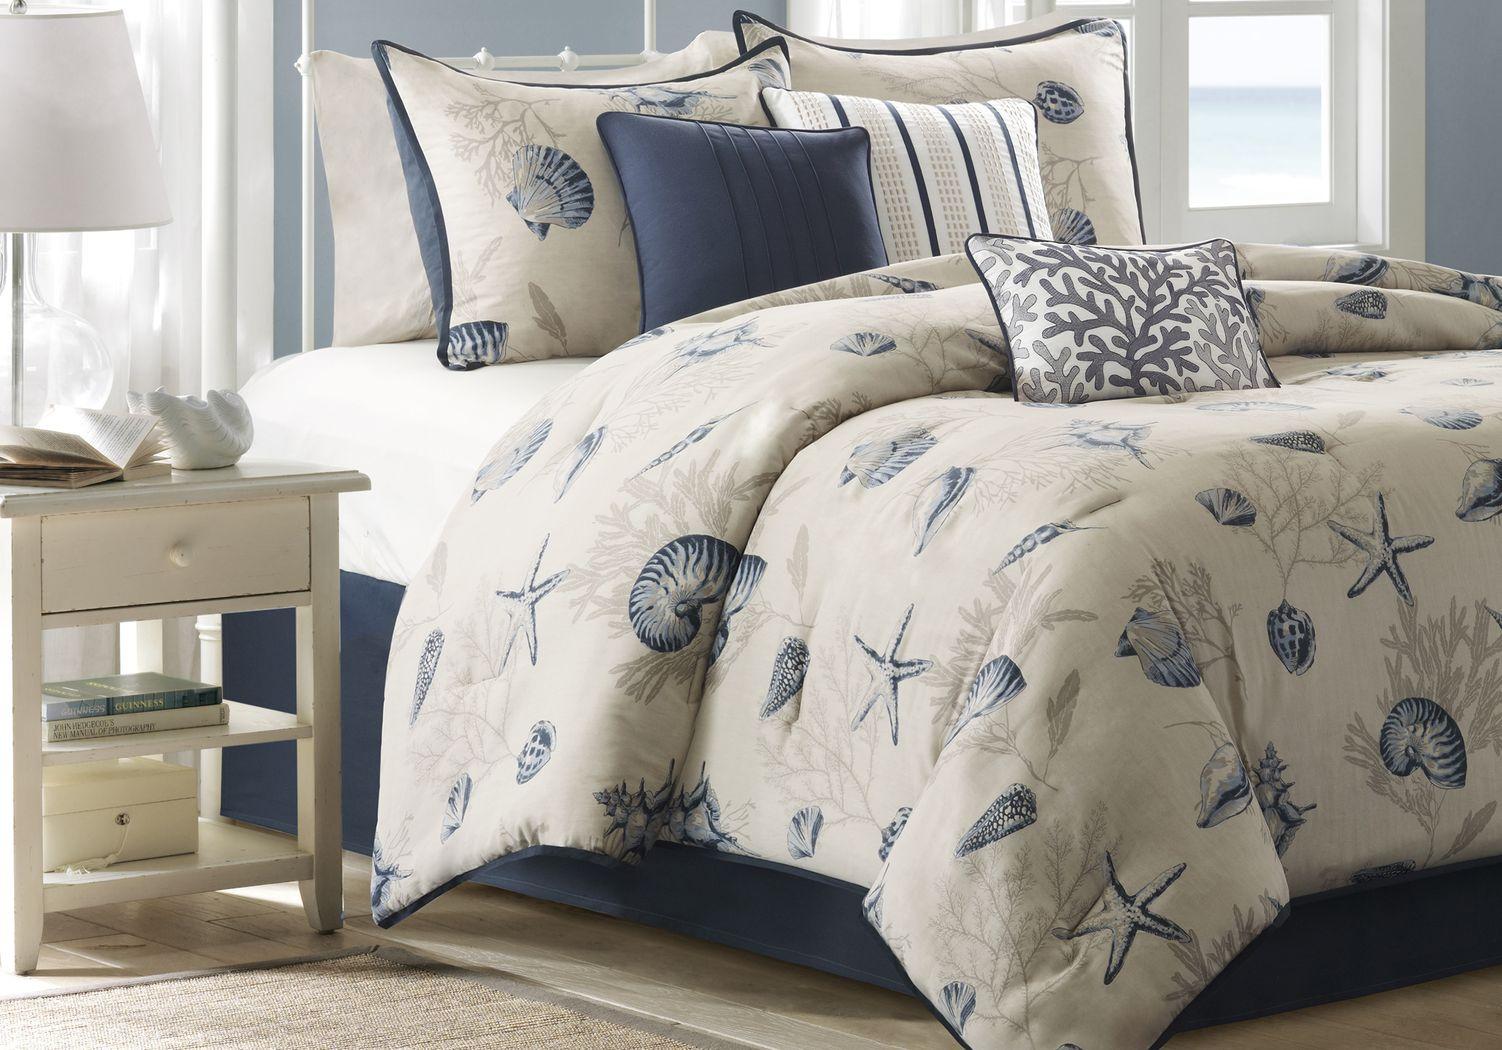 Beach Bedding Blankets Pillows Comforters Etc